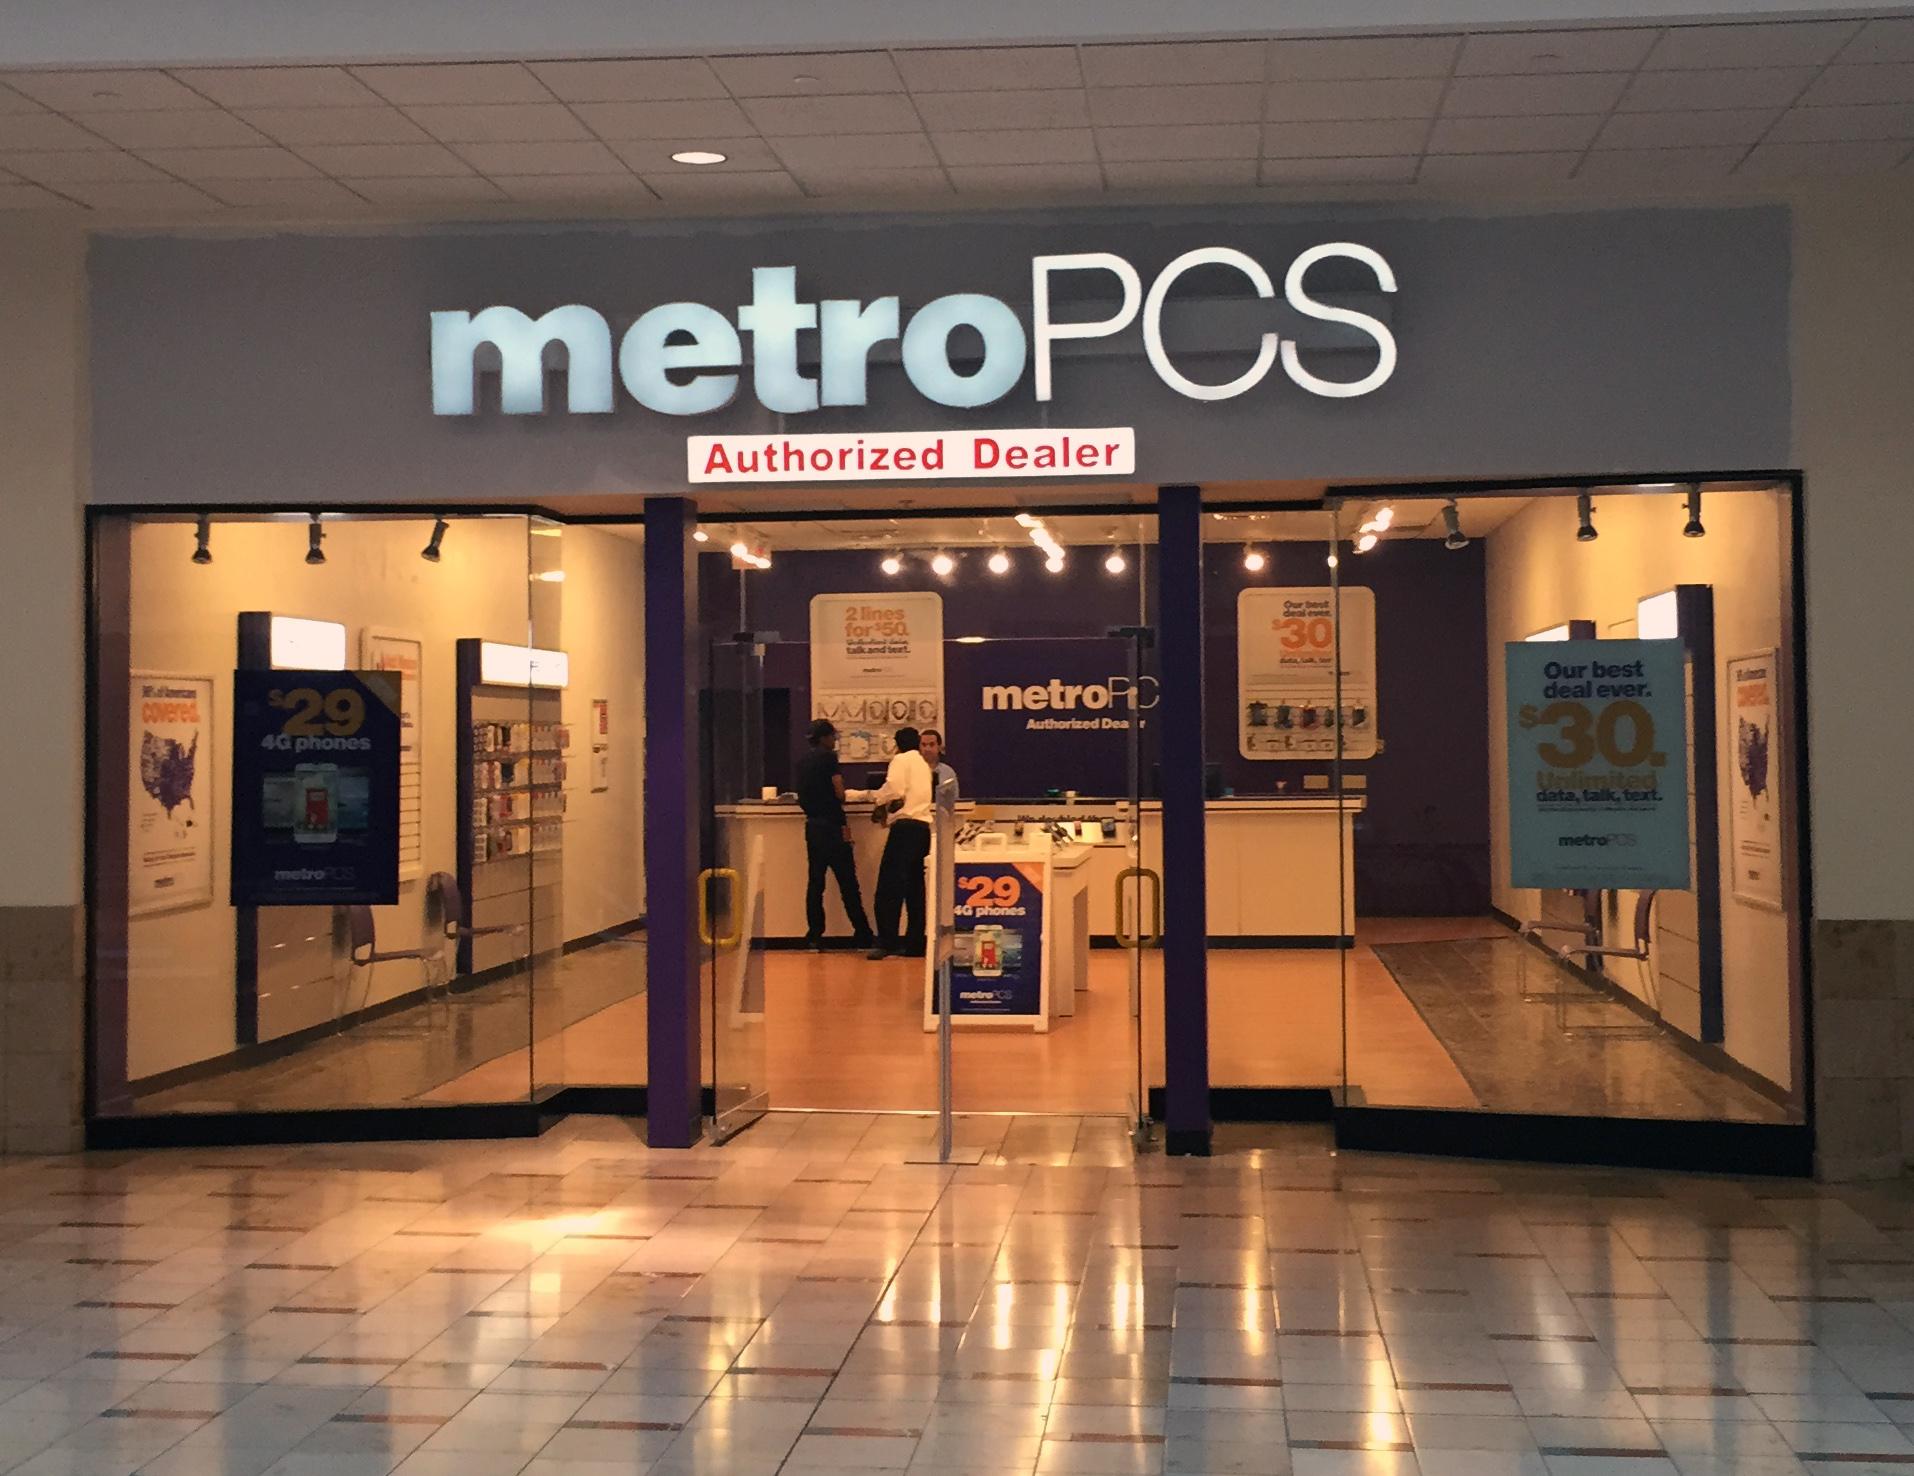 MetroPCS T-Mobile - Pahokee Questions